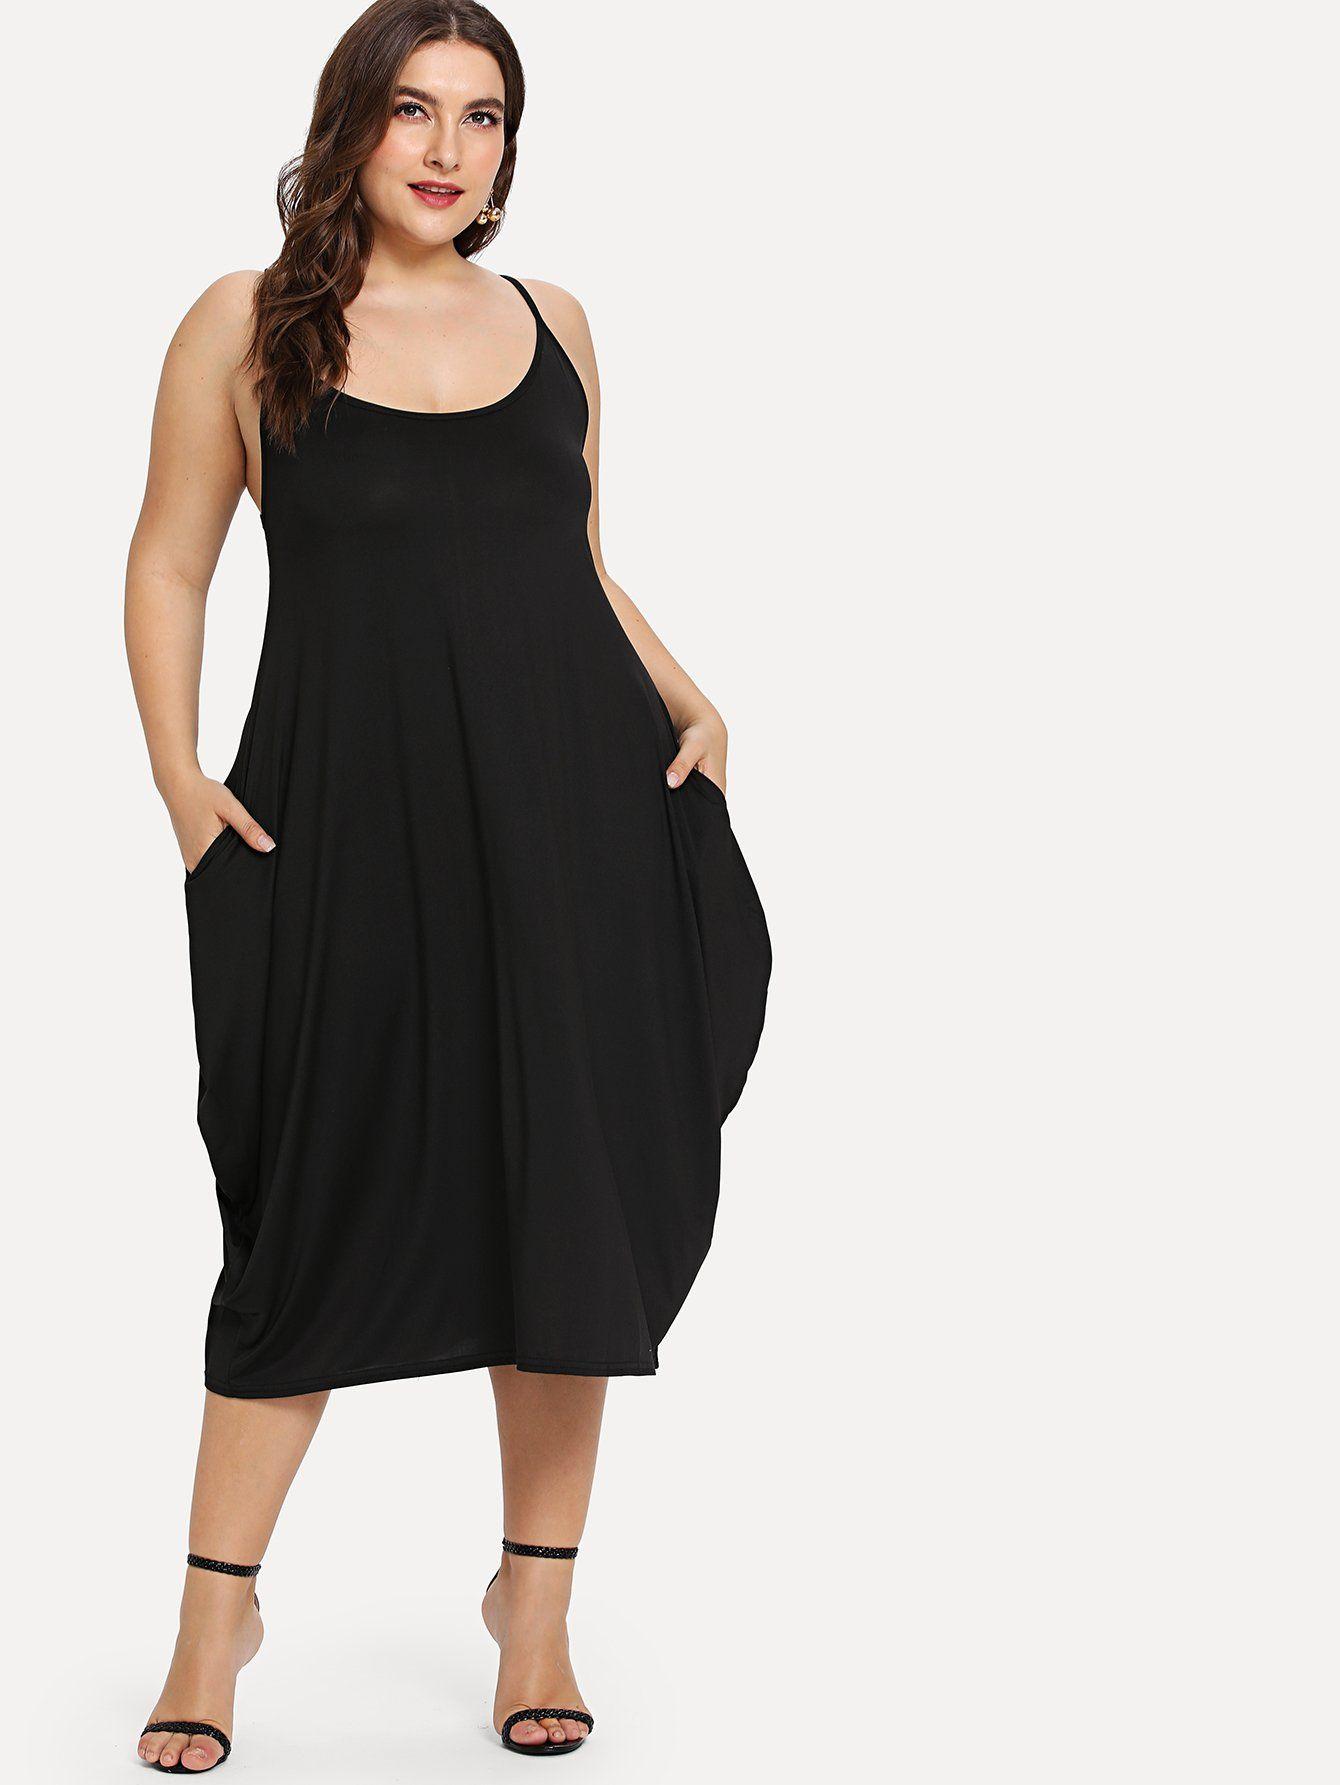 bac442c570 Hidden Pocket Solid Cami Dress -SheIn(Sheinside)   plus size clothes ...